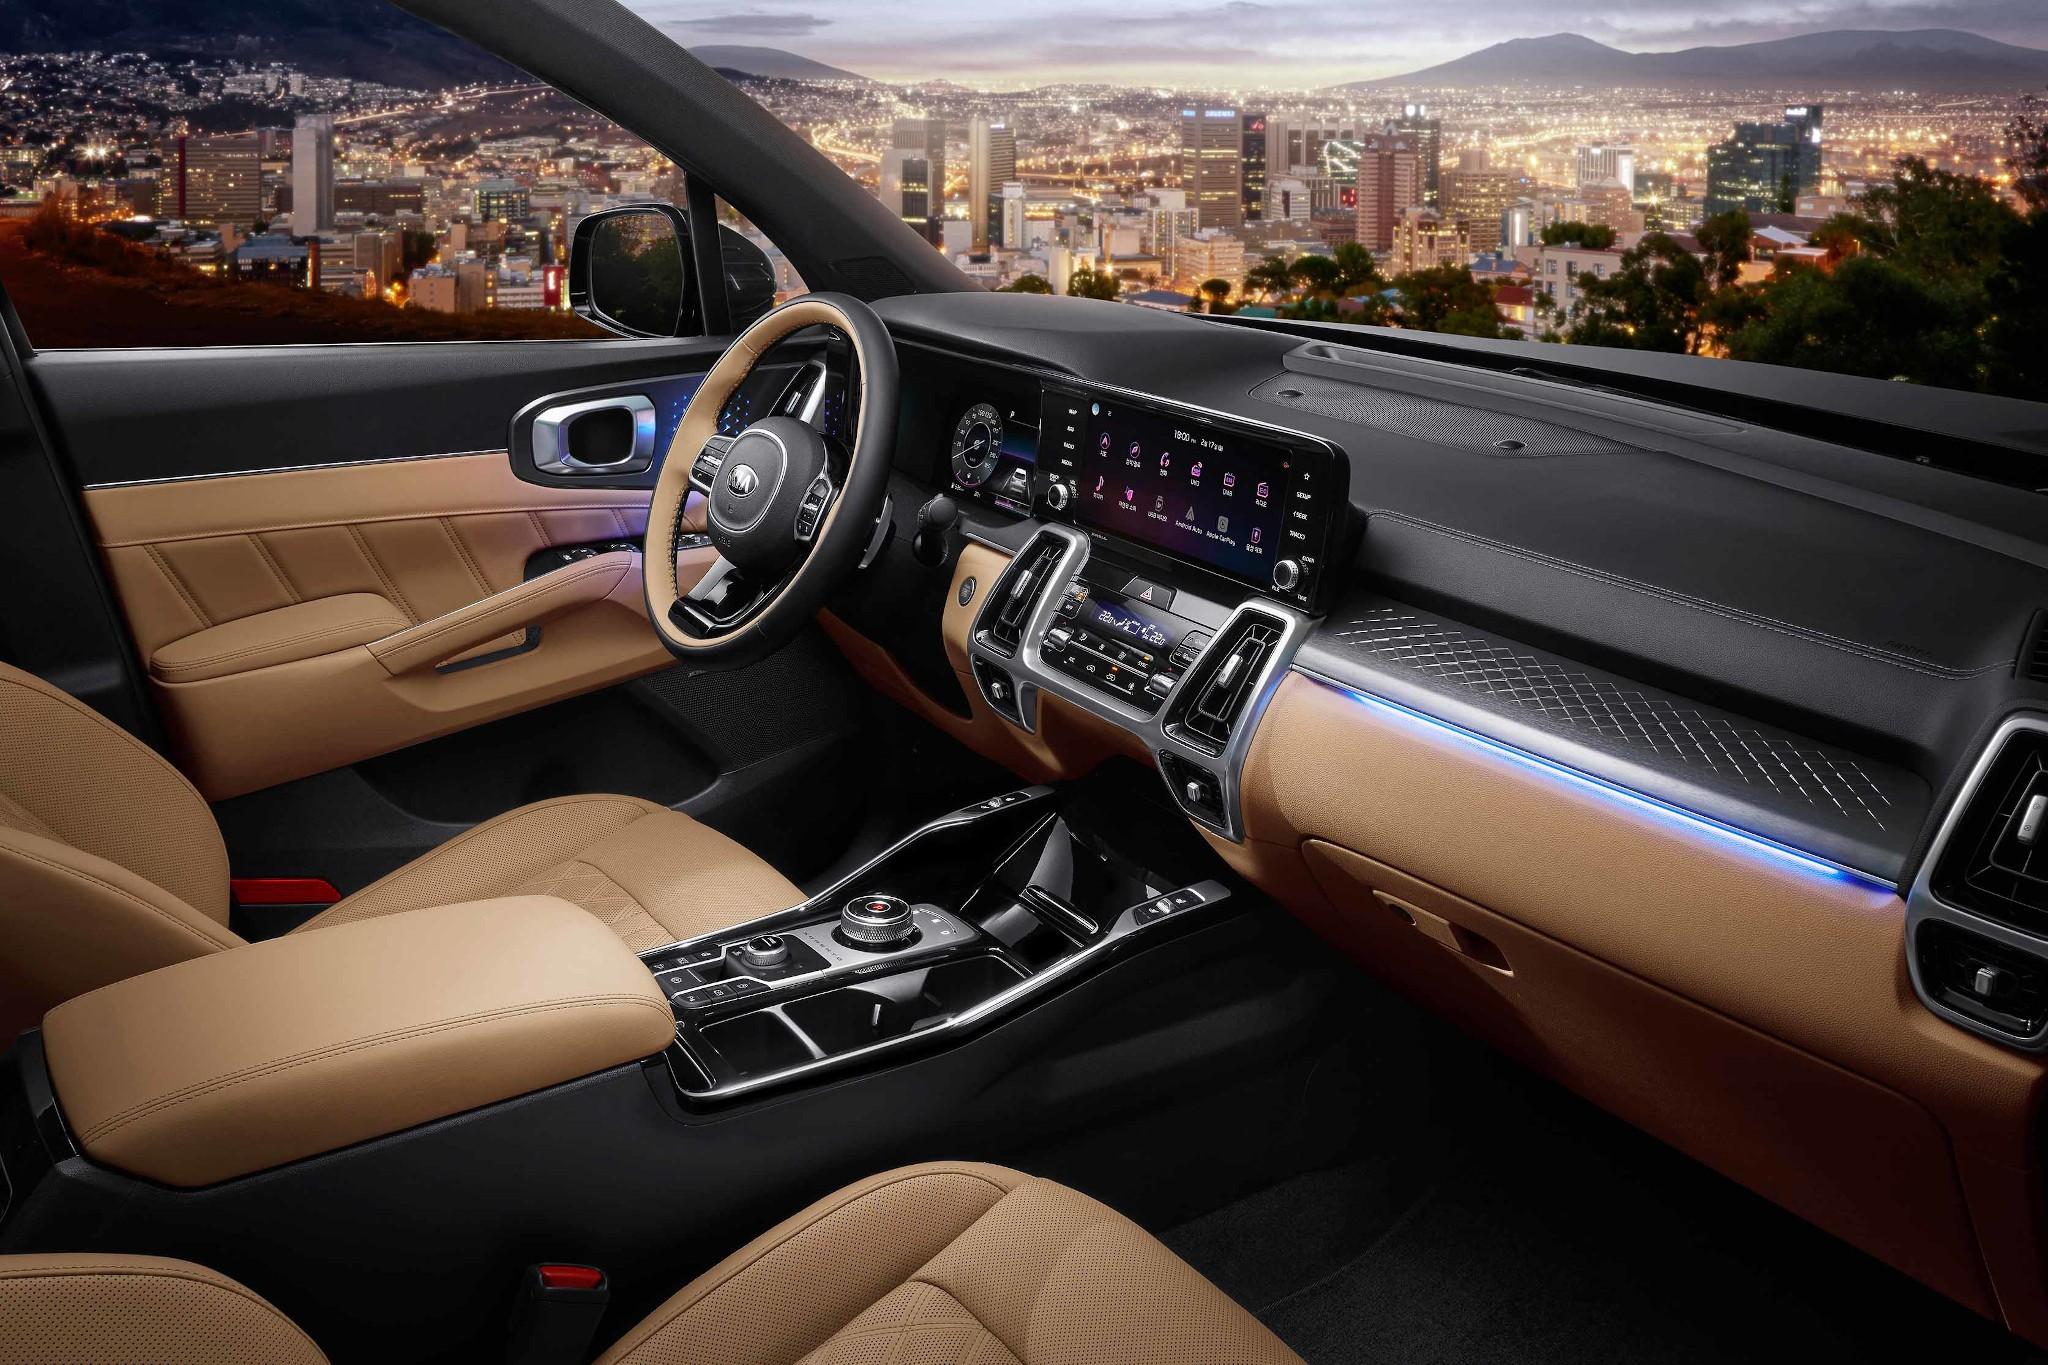 kia-sorento-2021-06-front-row--interior.jpg